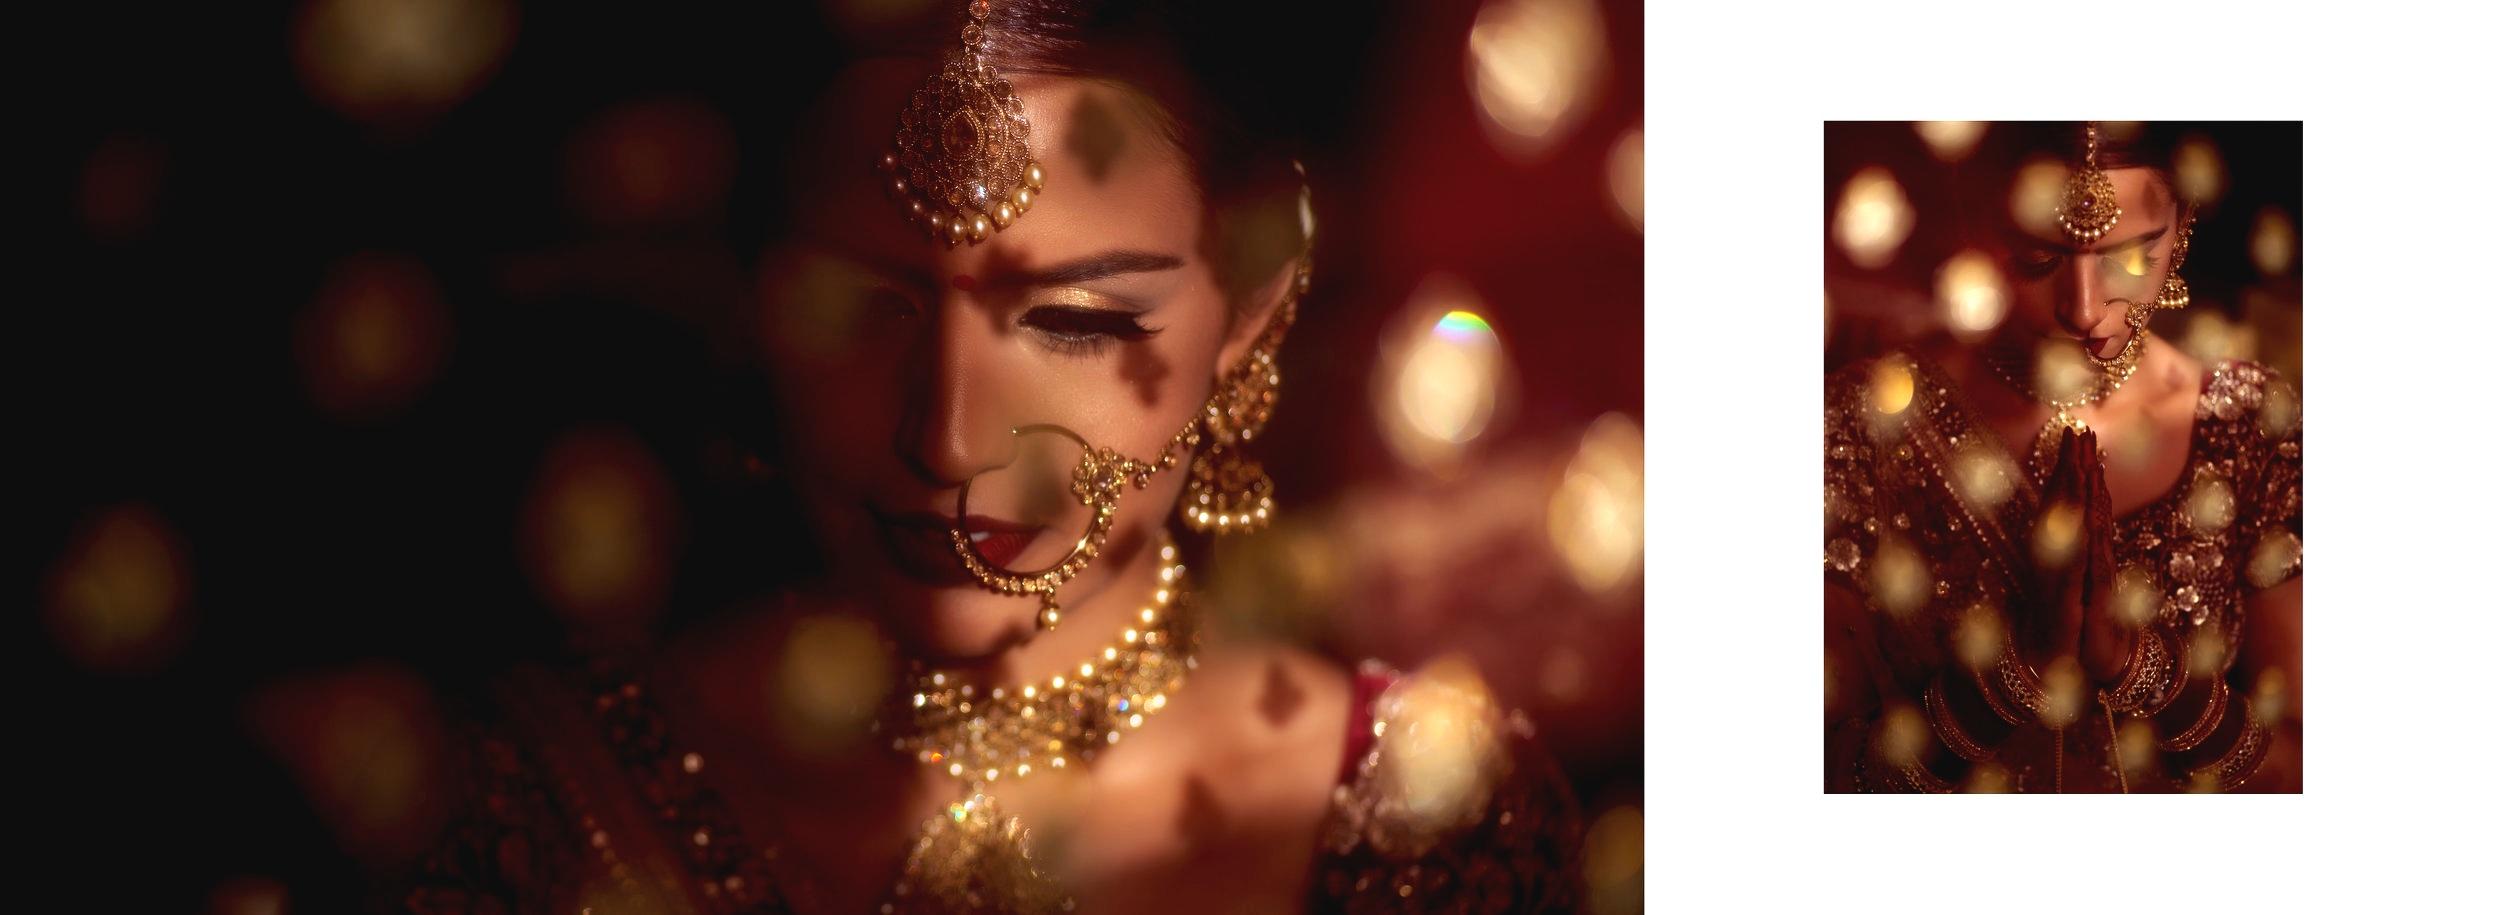 Sikh+Wedding+-+Jaspreet+and+Indy-8.jpg